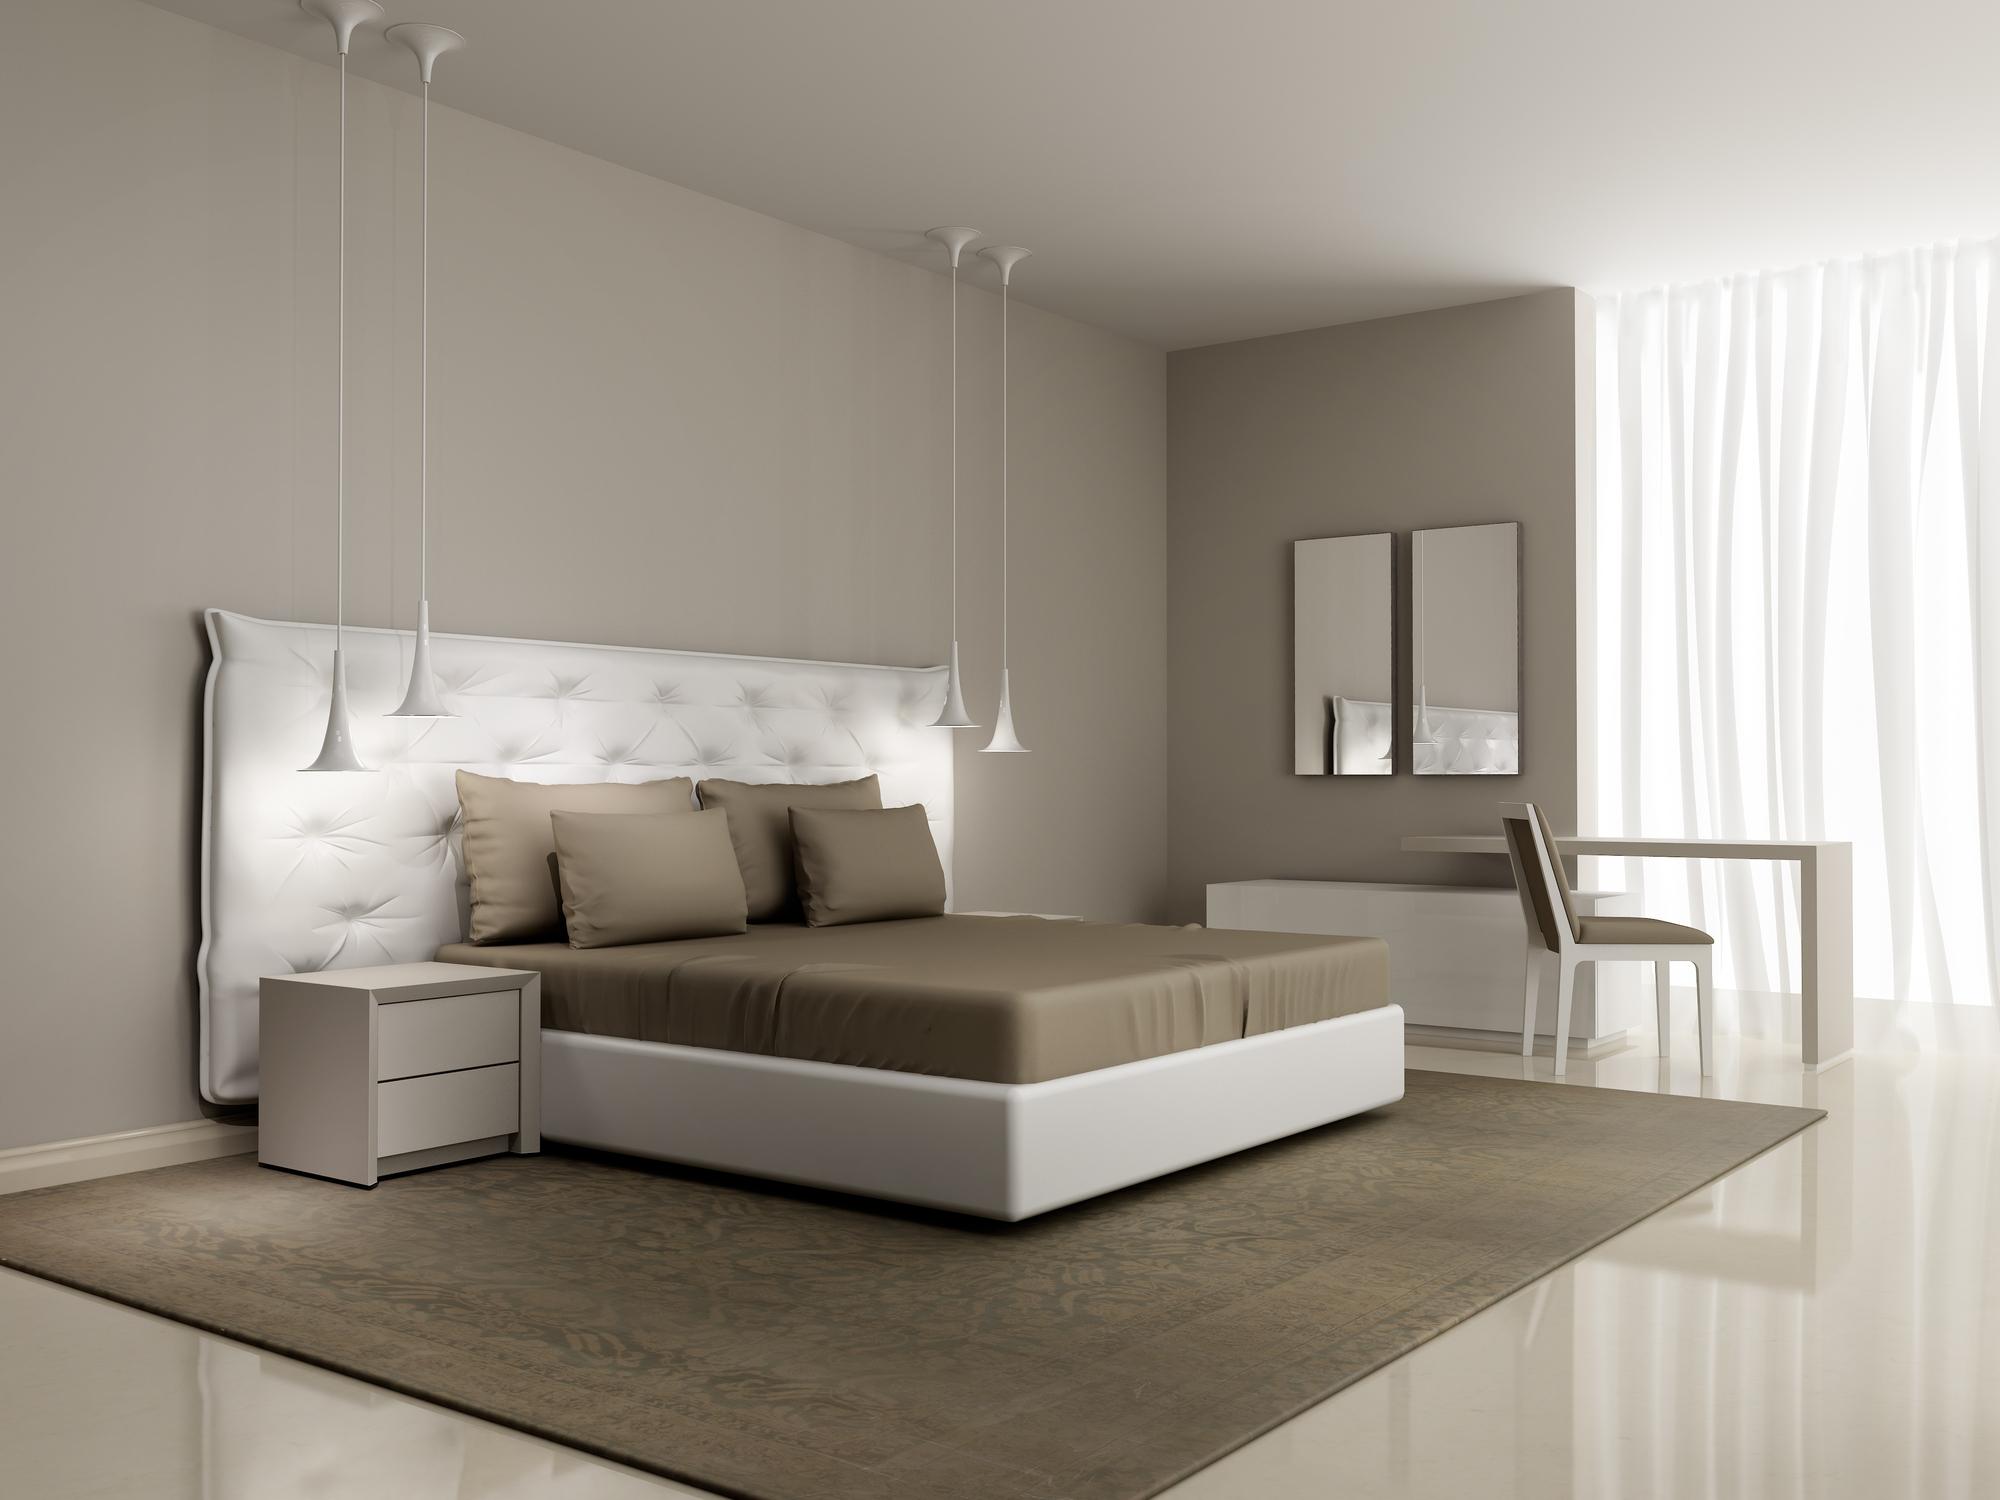 Egzotikus feh r h l szoba fundamenta otthonok s - Tinte camere da letto ...